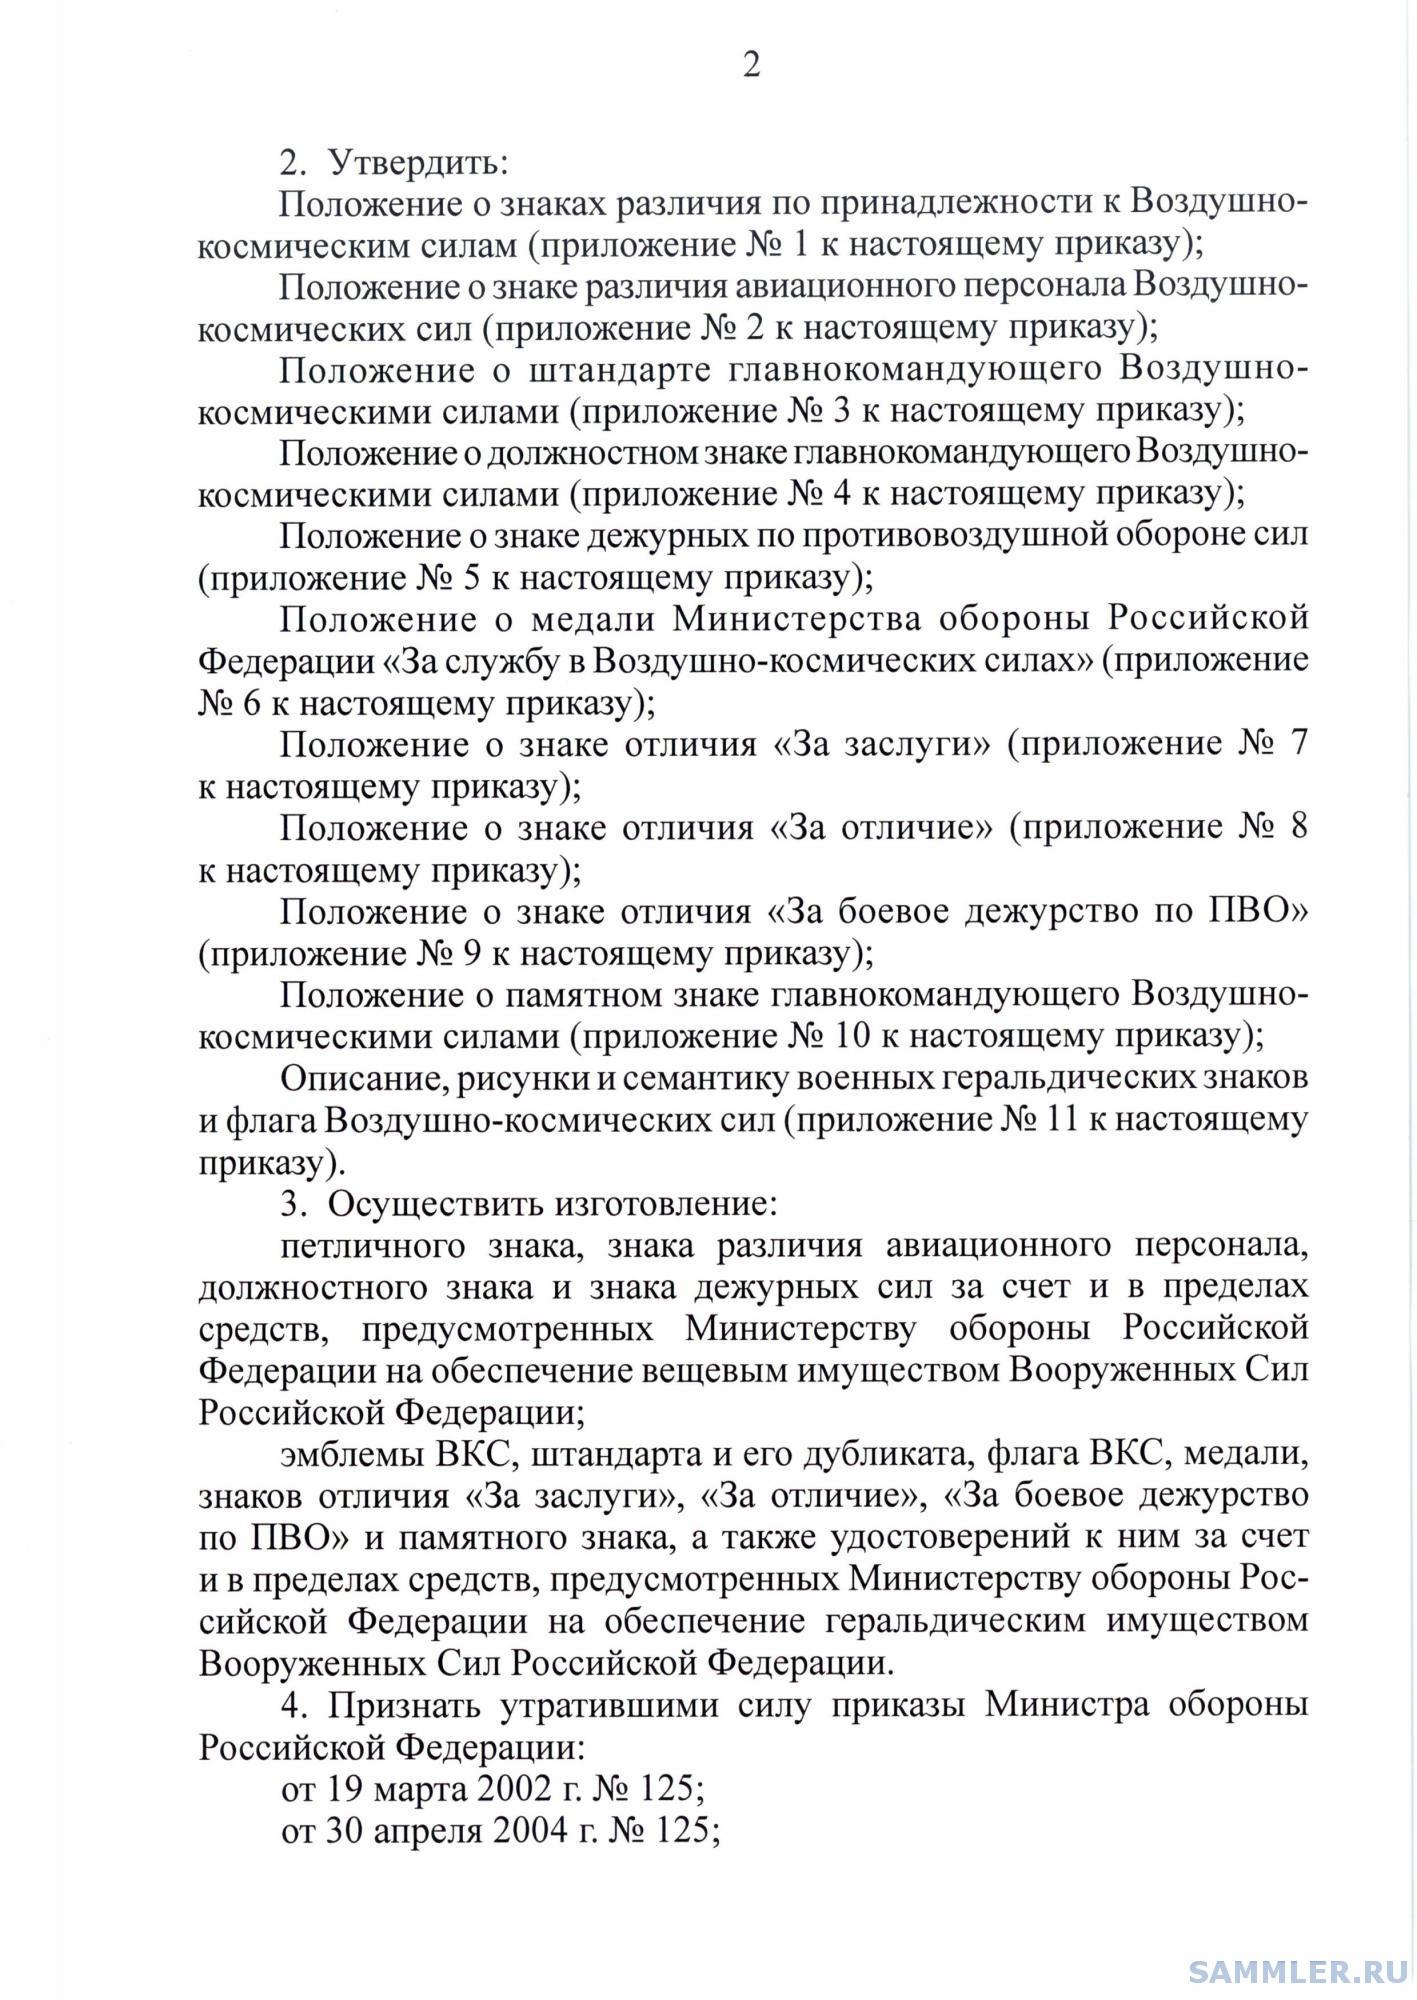 МО РФ 470(цвет)-2.jpg